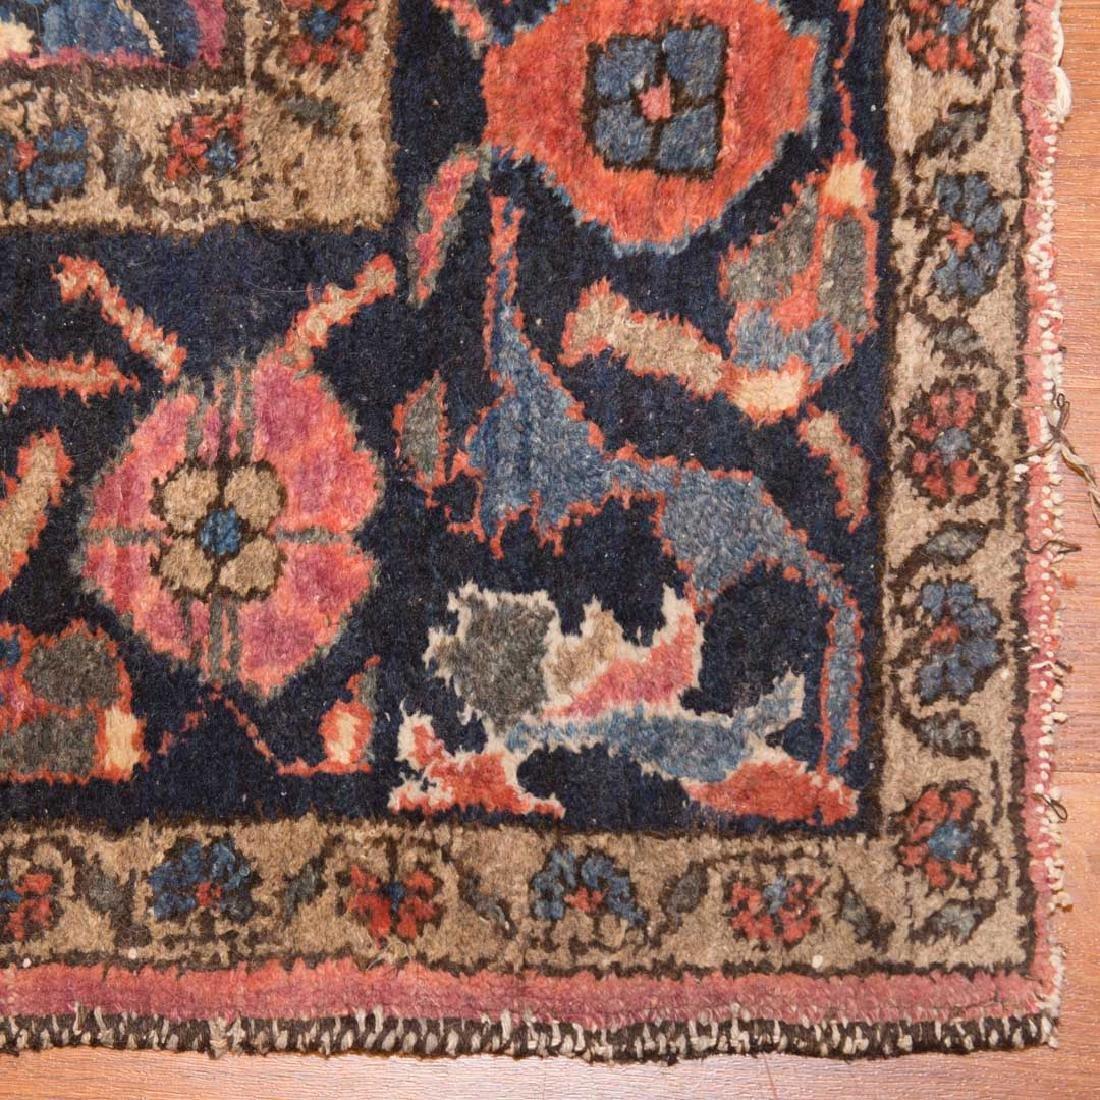 Antique Lilehan rug, approx. 5.5 x 7.3 - 2